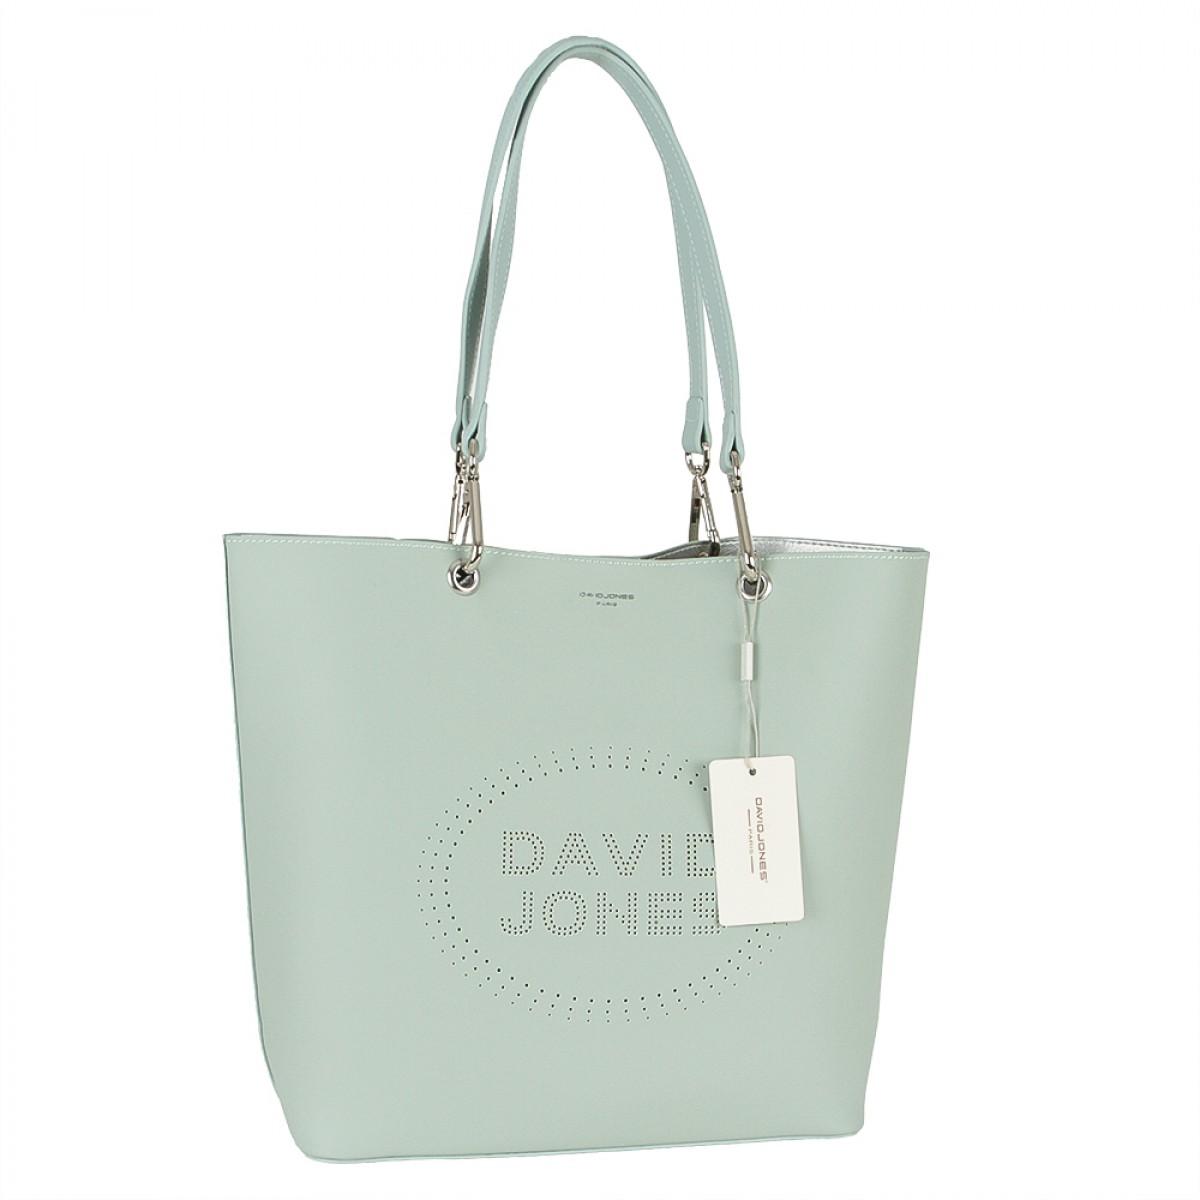 Жіноча сумка David Jones 6223-1 PALE GREEN